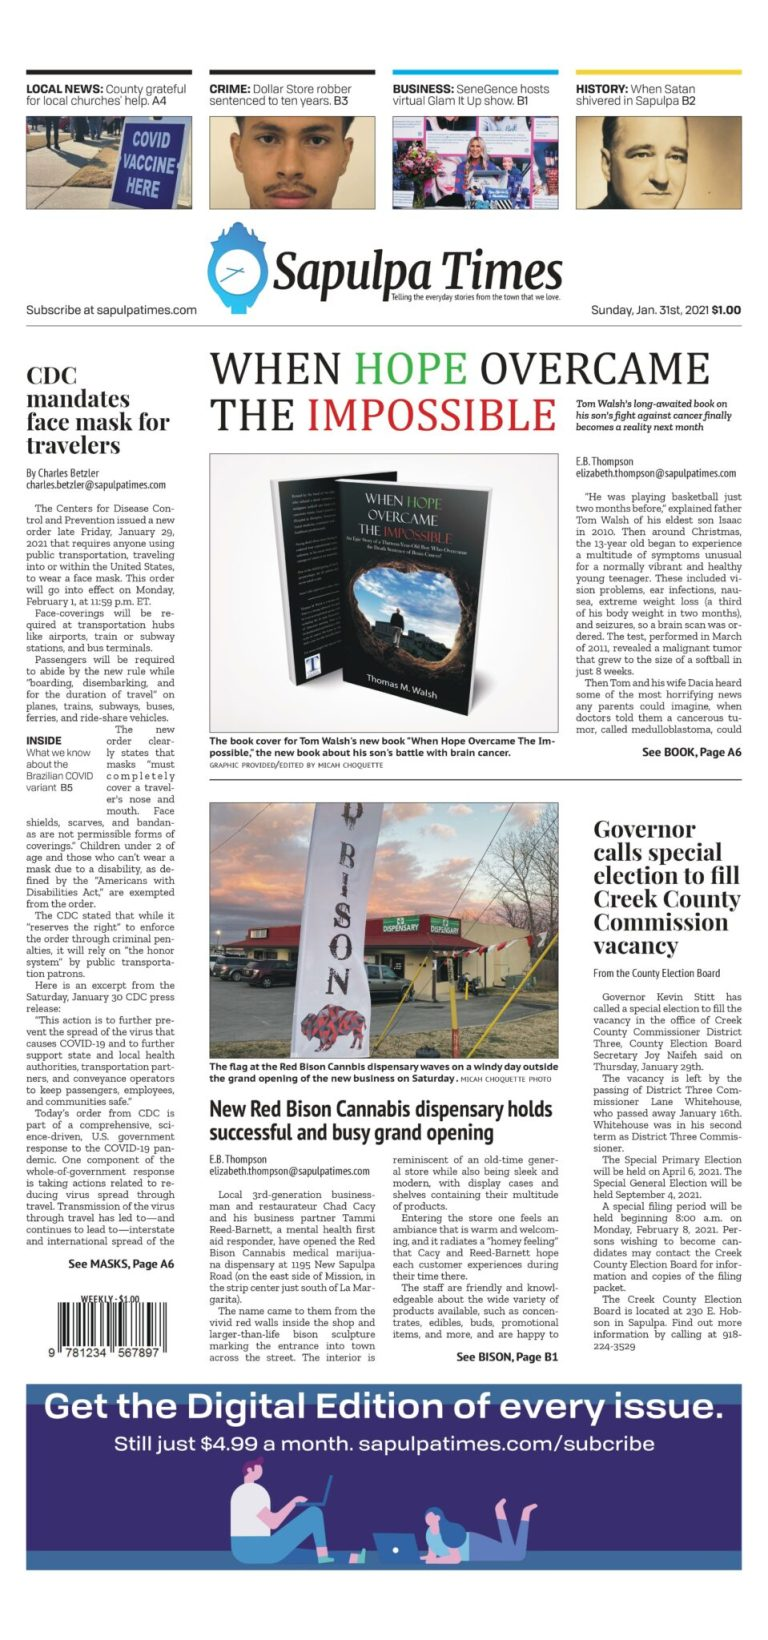 Sapulpa Times Digital Edition 01/31/2021